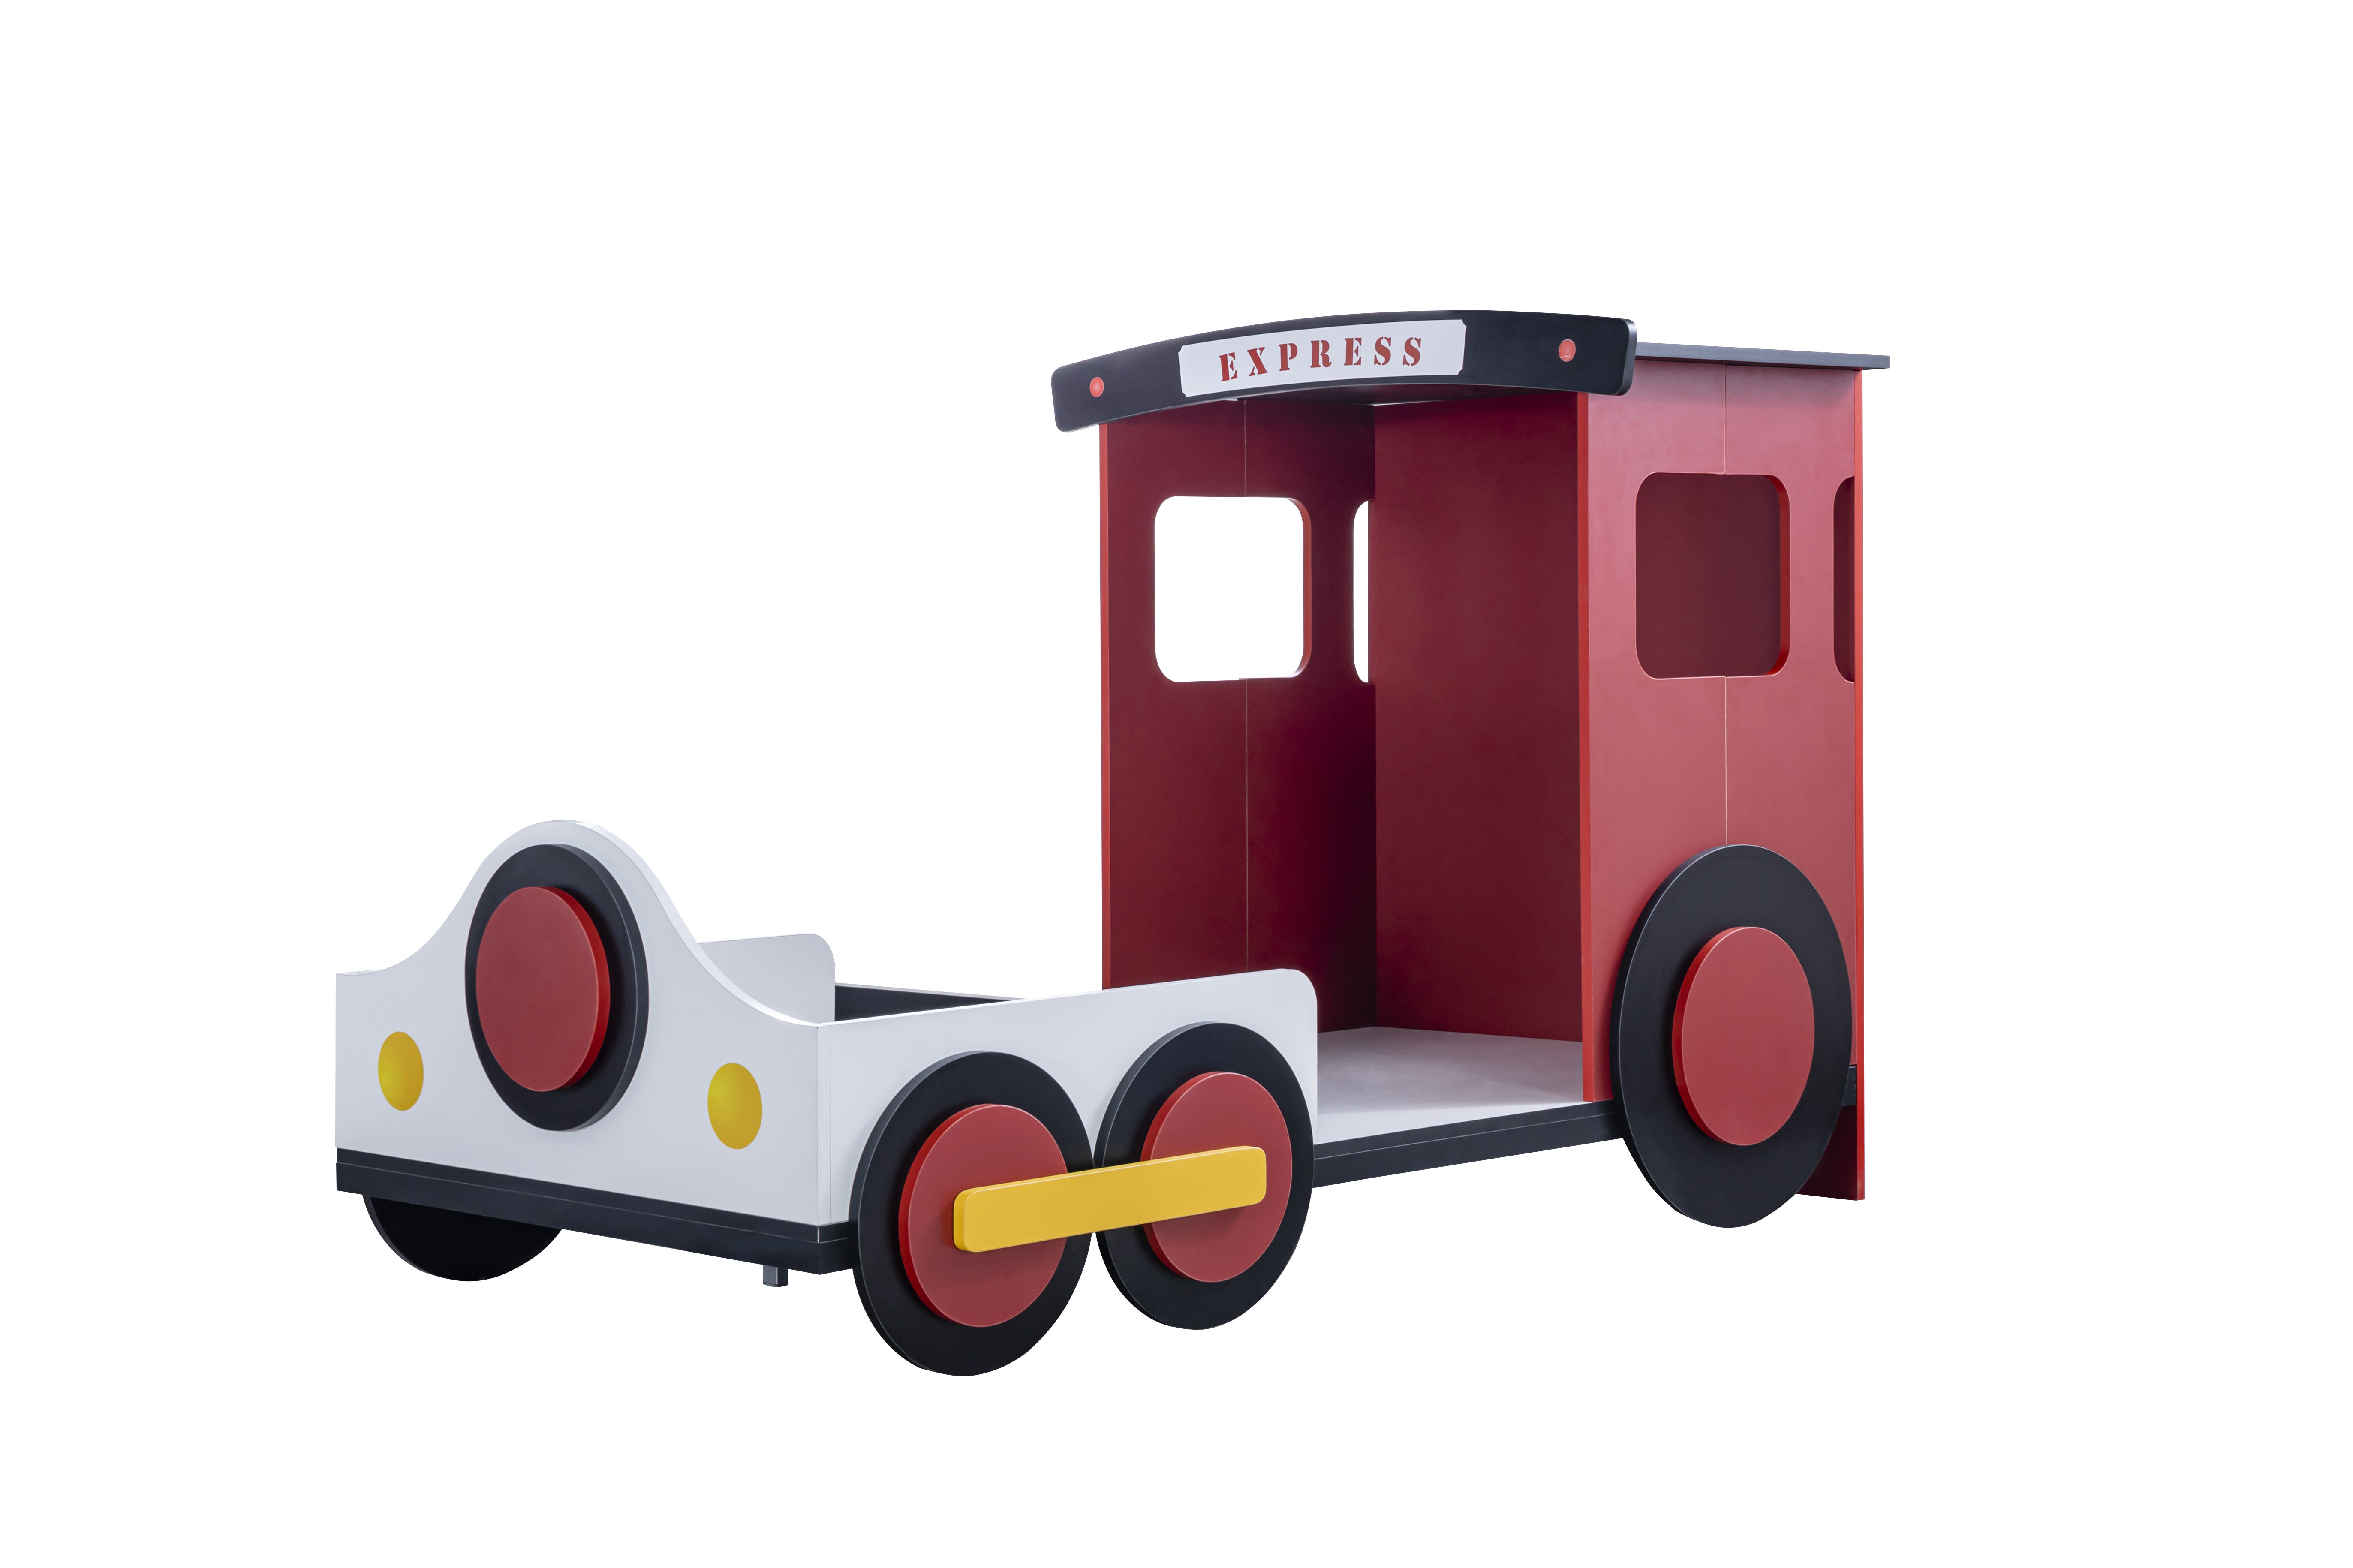 Odacix Kinderbett Express im Lokomotiven Design